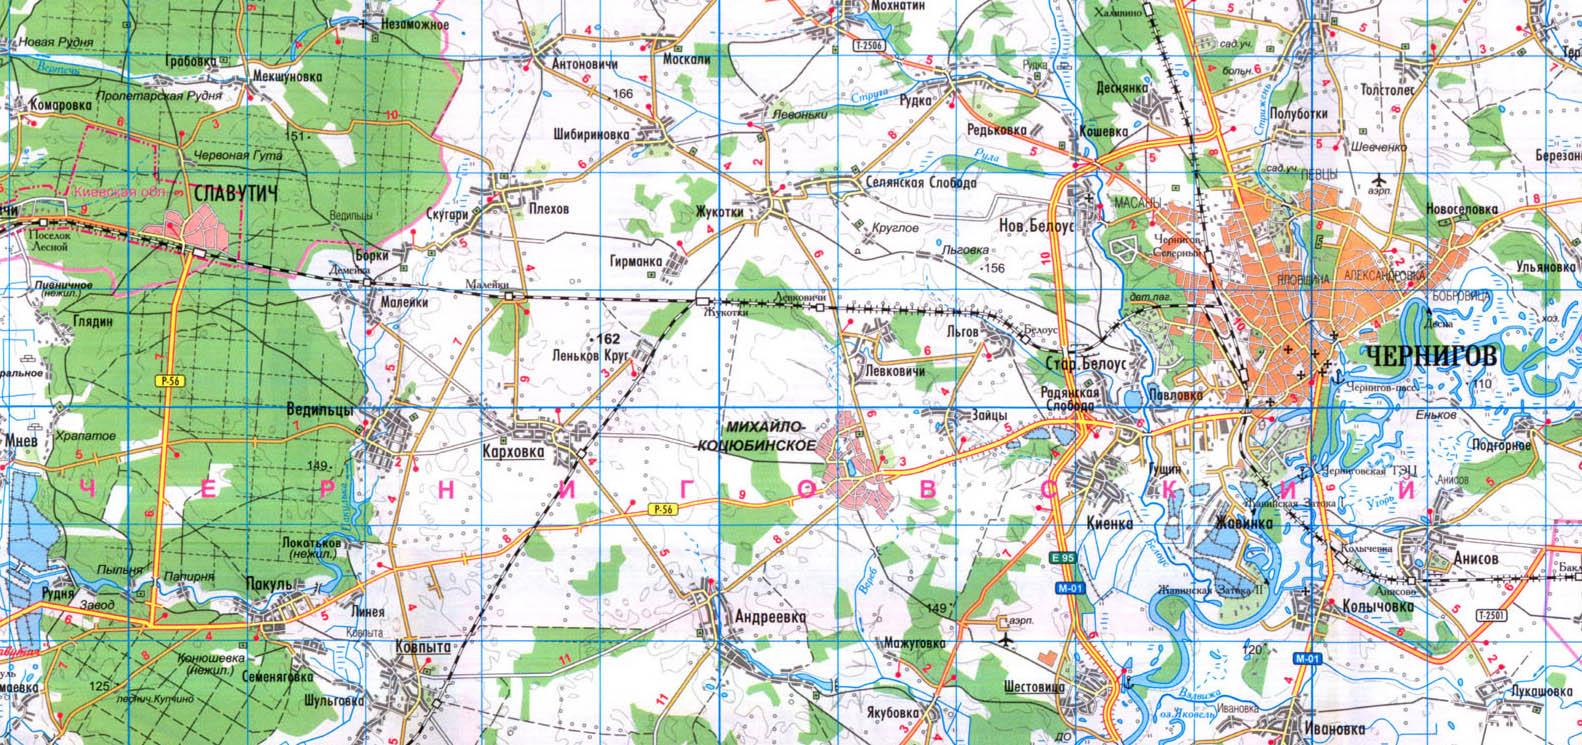 Карта дороги Чернигов-Славутич: